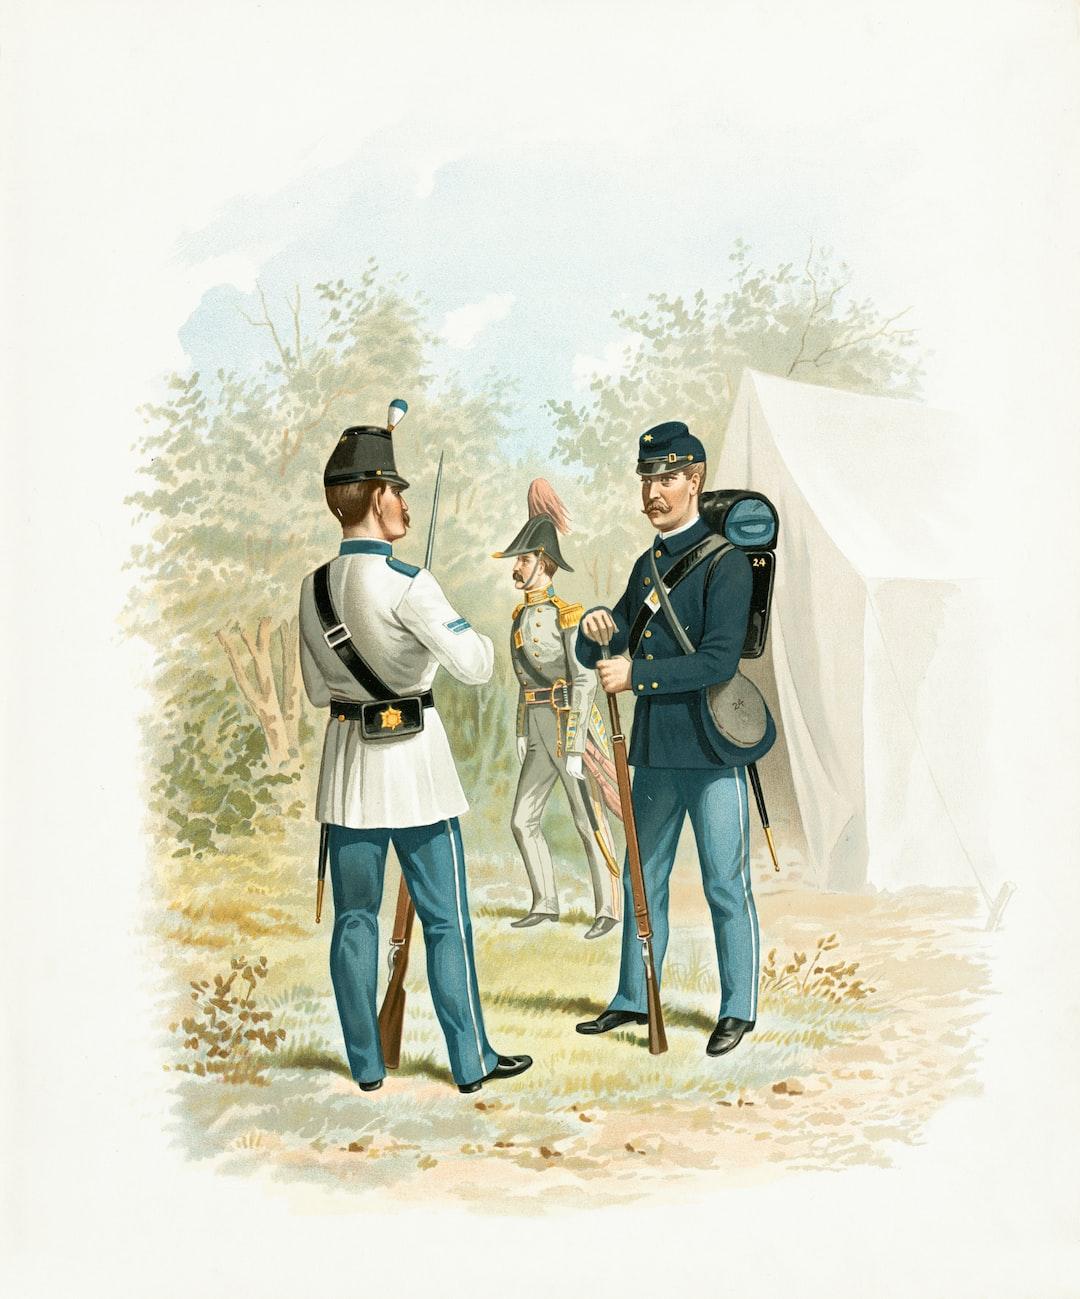 1st Corps of Cadets 1741-1894. Artist: Tholey, Augustus https://ark.digitalcommonwealth.org/ark:/50959/w6634452m  Please visit Digital Commonwealth to view more images: https://www.digitalcommonwealth.org.